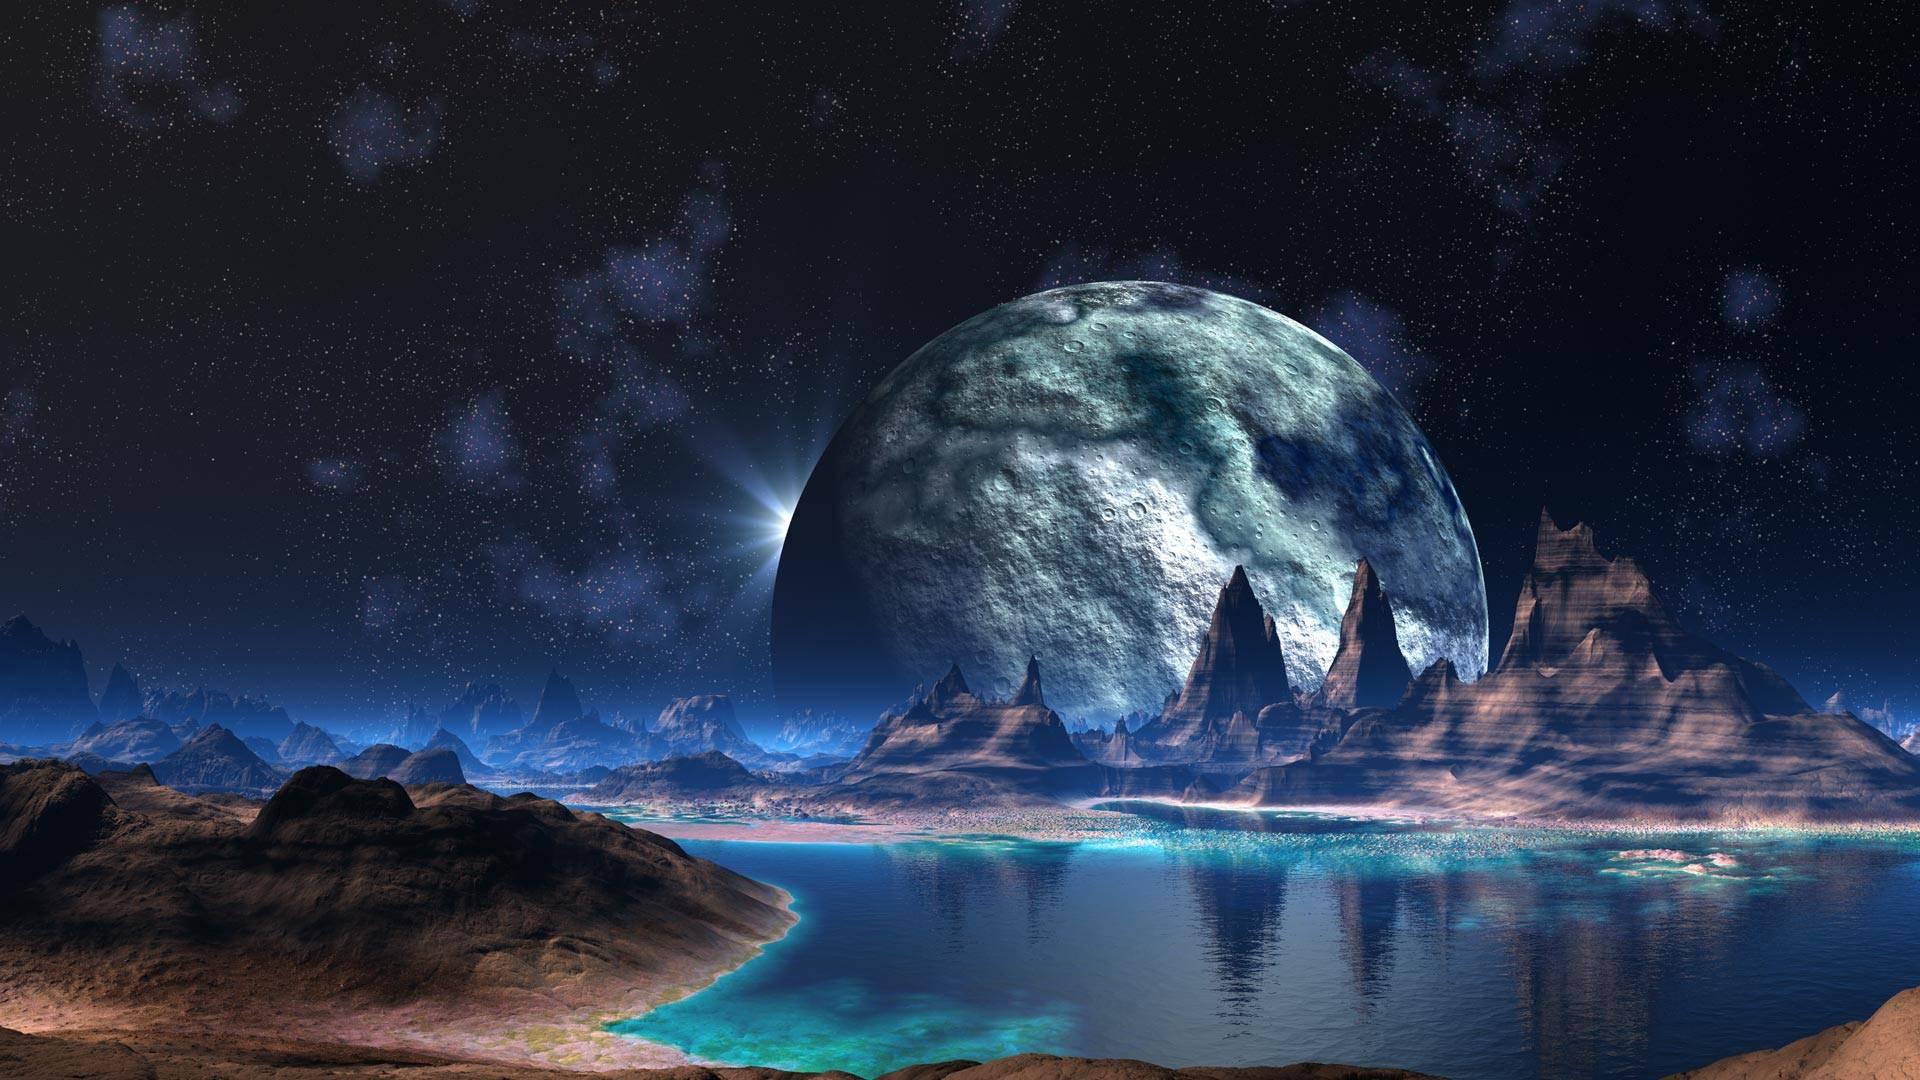 sci fi space reflection mountains wallpaper 1920x1080 72079 1920x1080